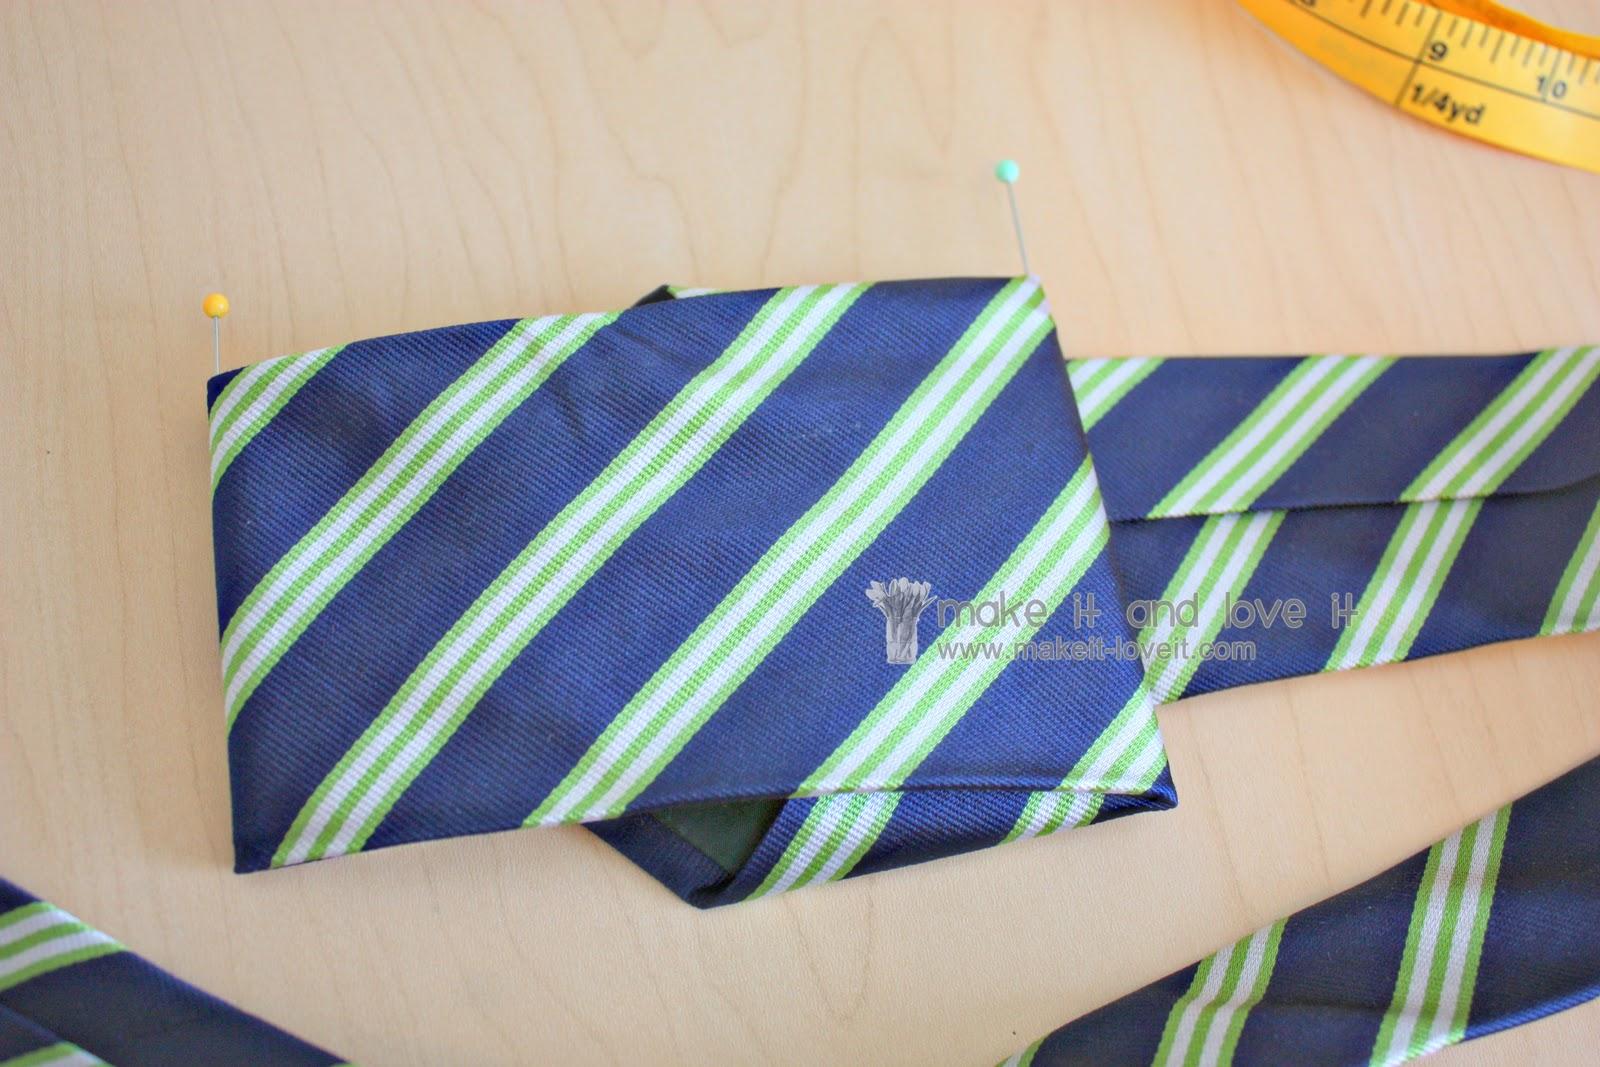 Repurposing Repurposing Neck Tie Into Bow Tie Make It And Love It